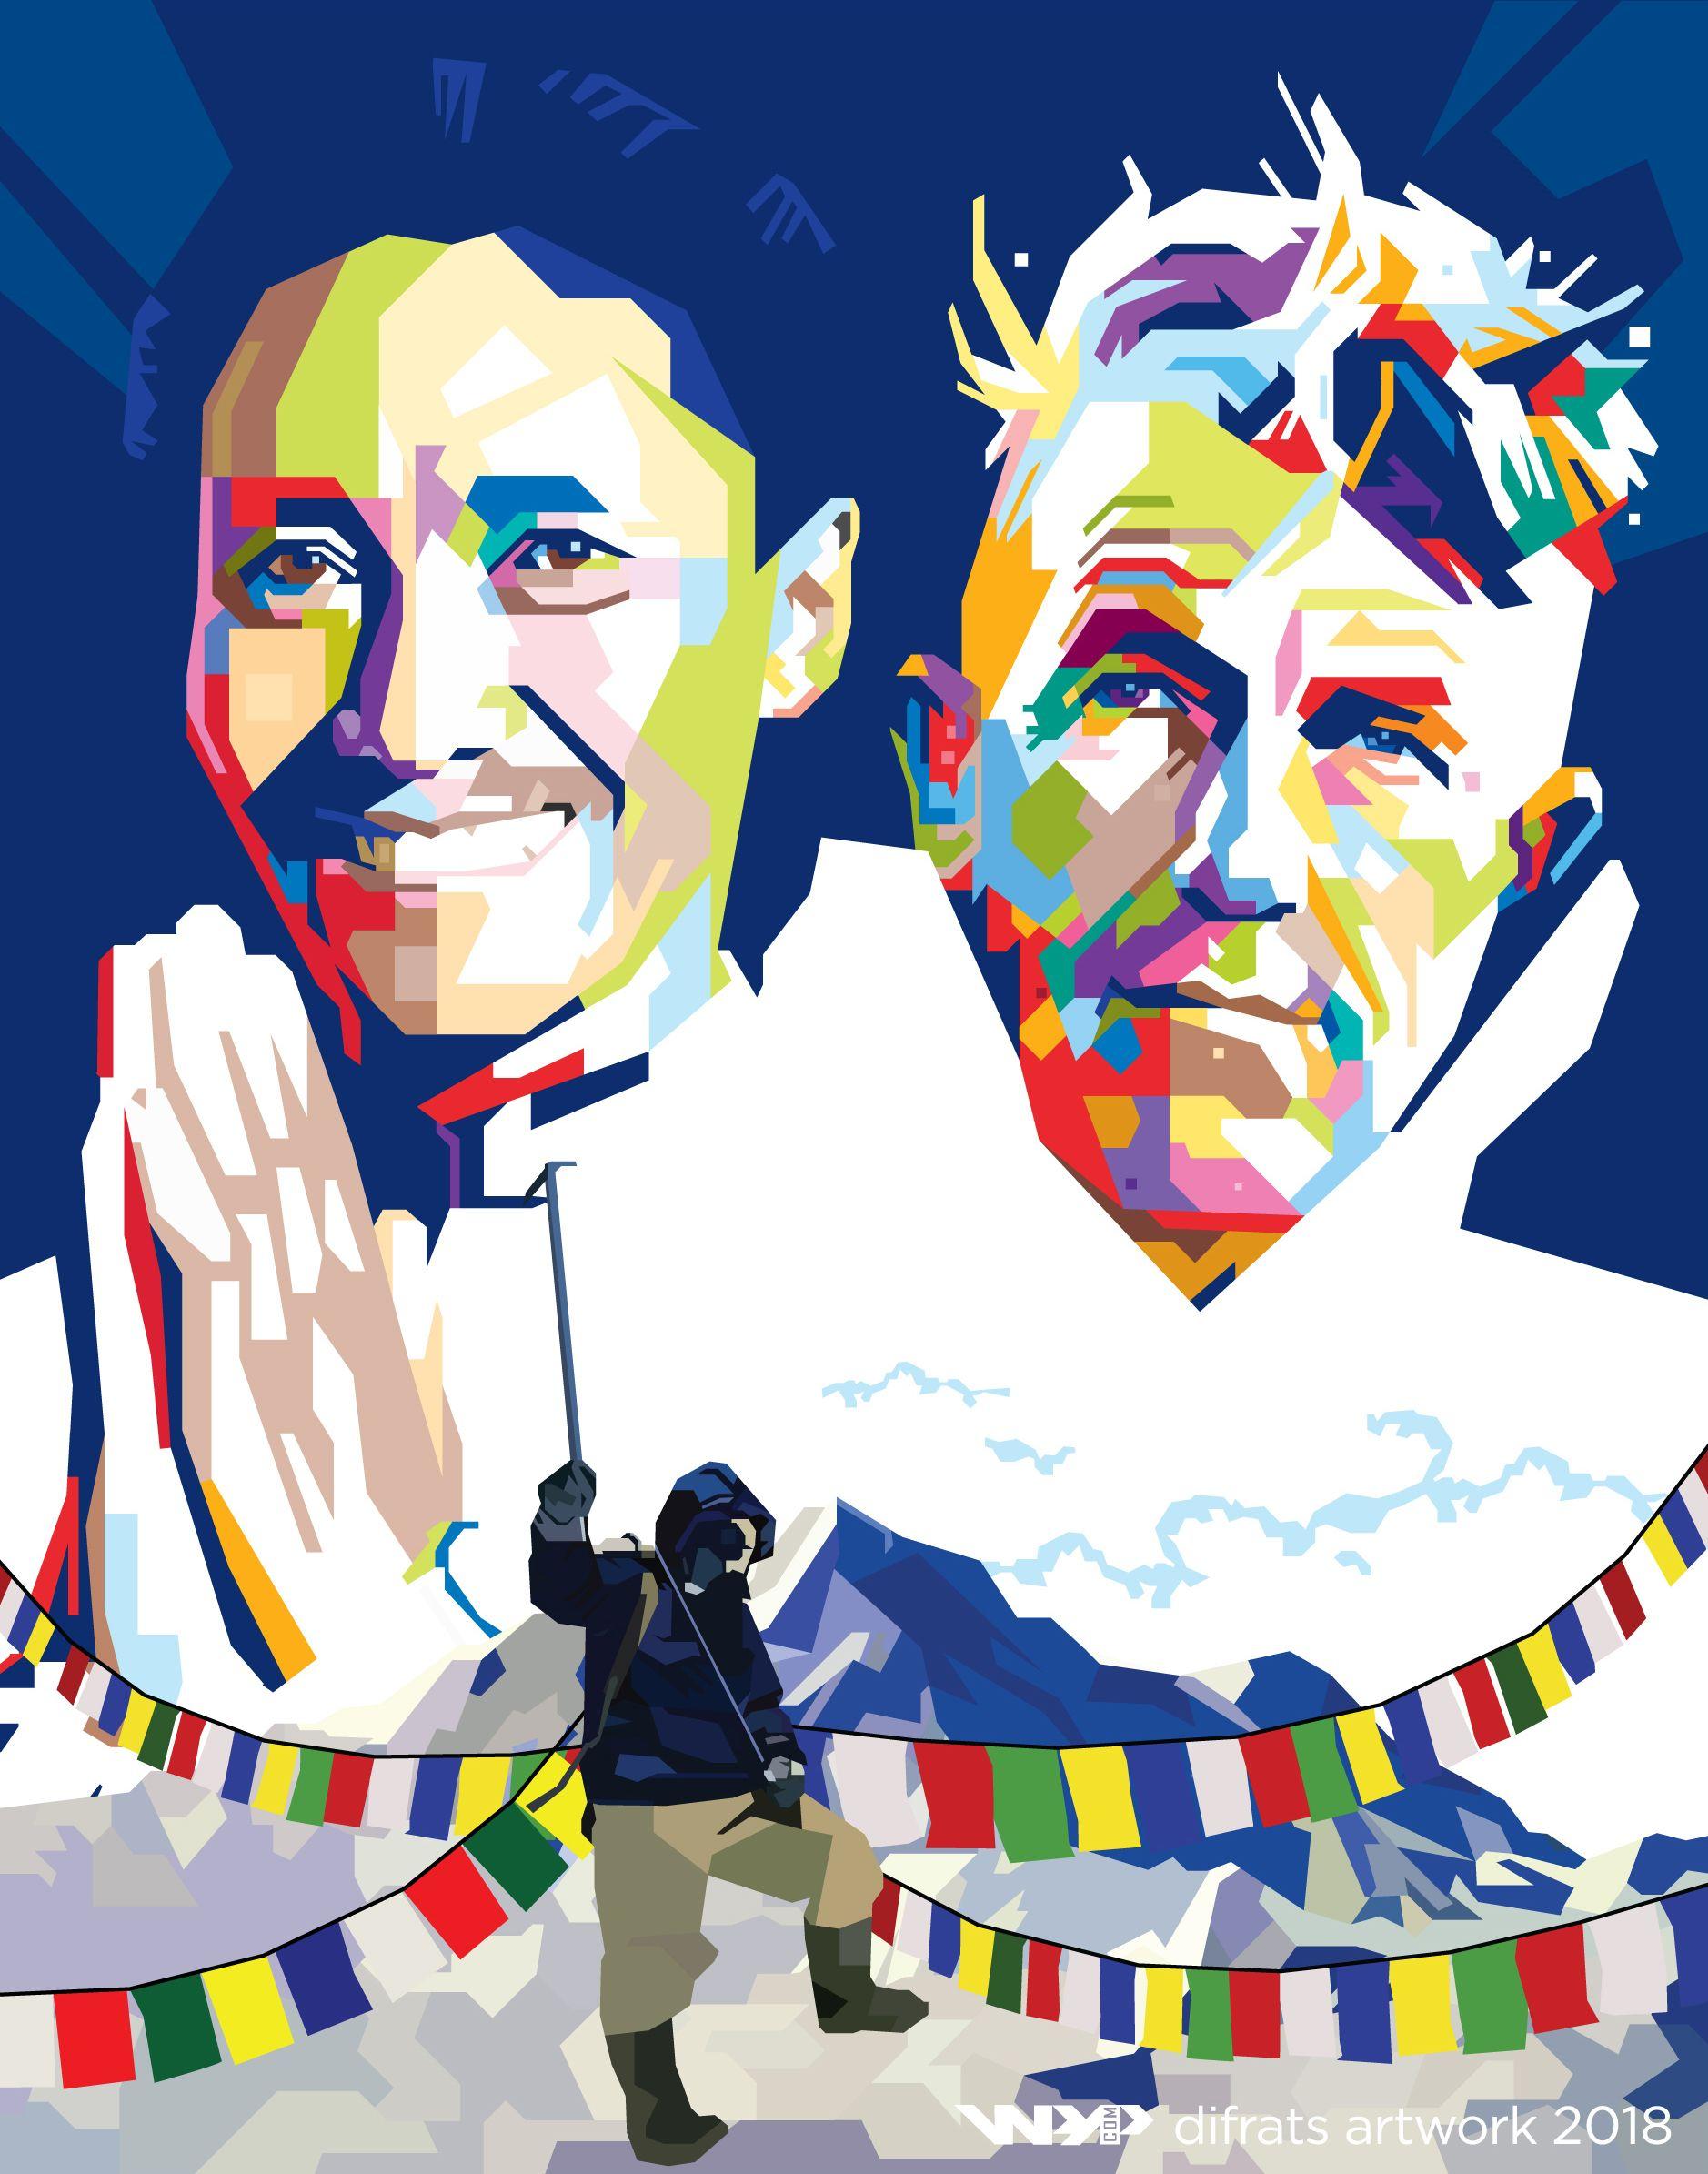 Tenzing Norgay Sherpa & Sir Edmund Hillary wpap by difrats #art #vector #wpap #popart #everest #tenzingnorgay #edmundhillary